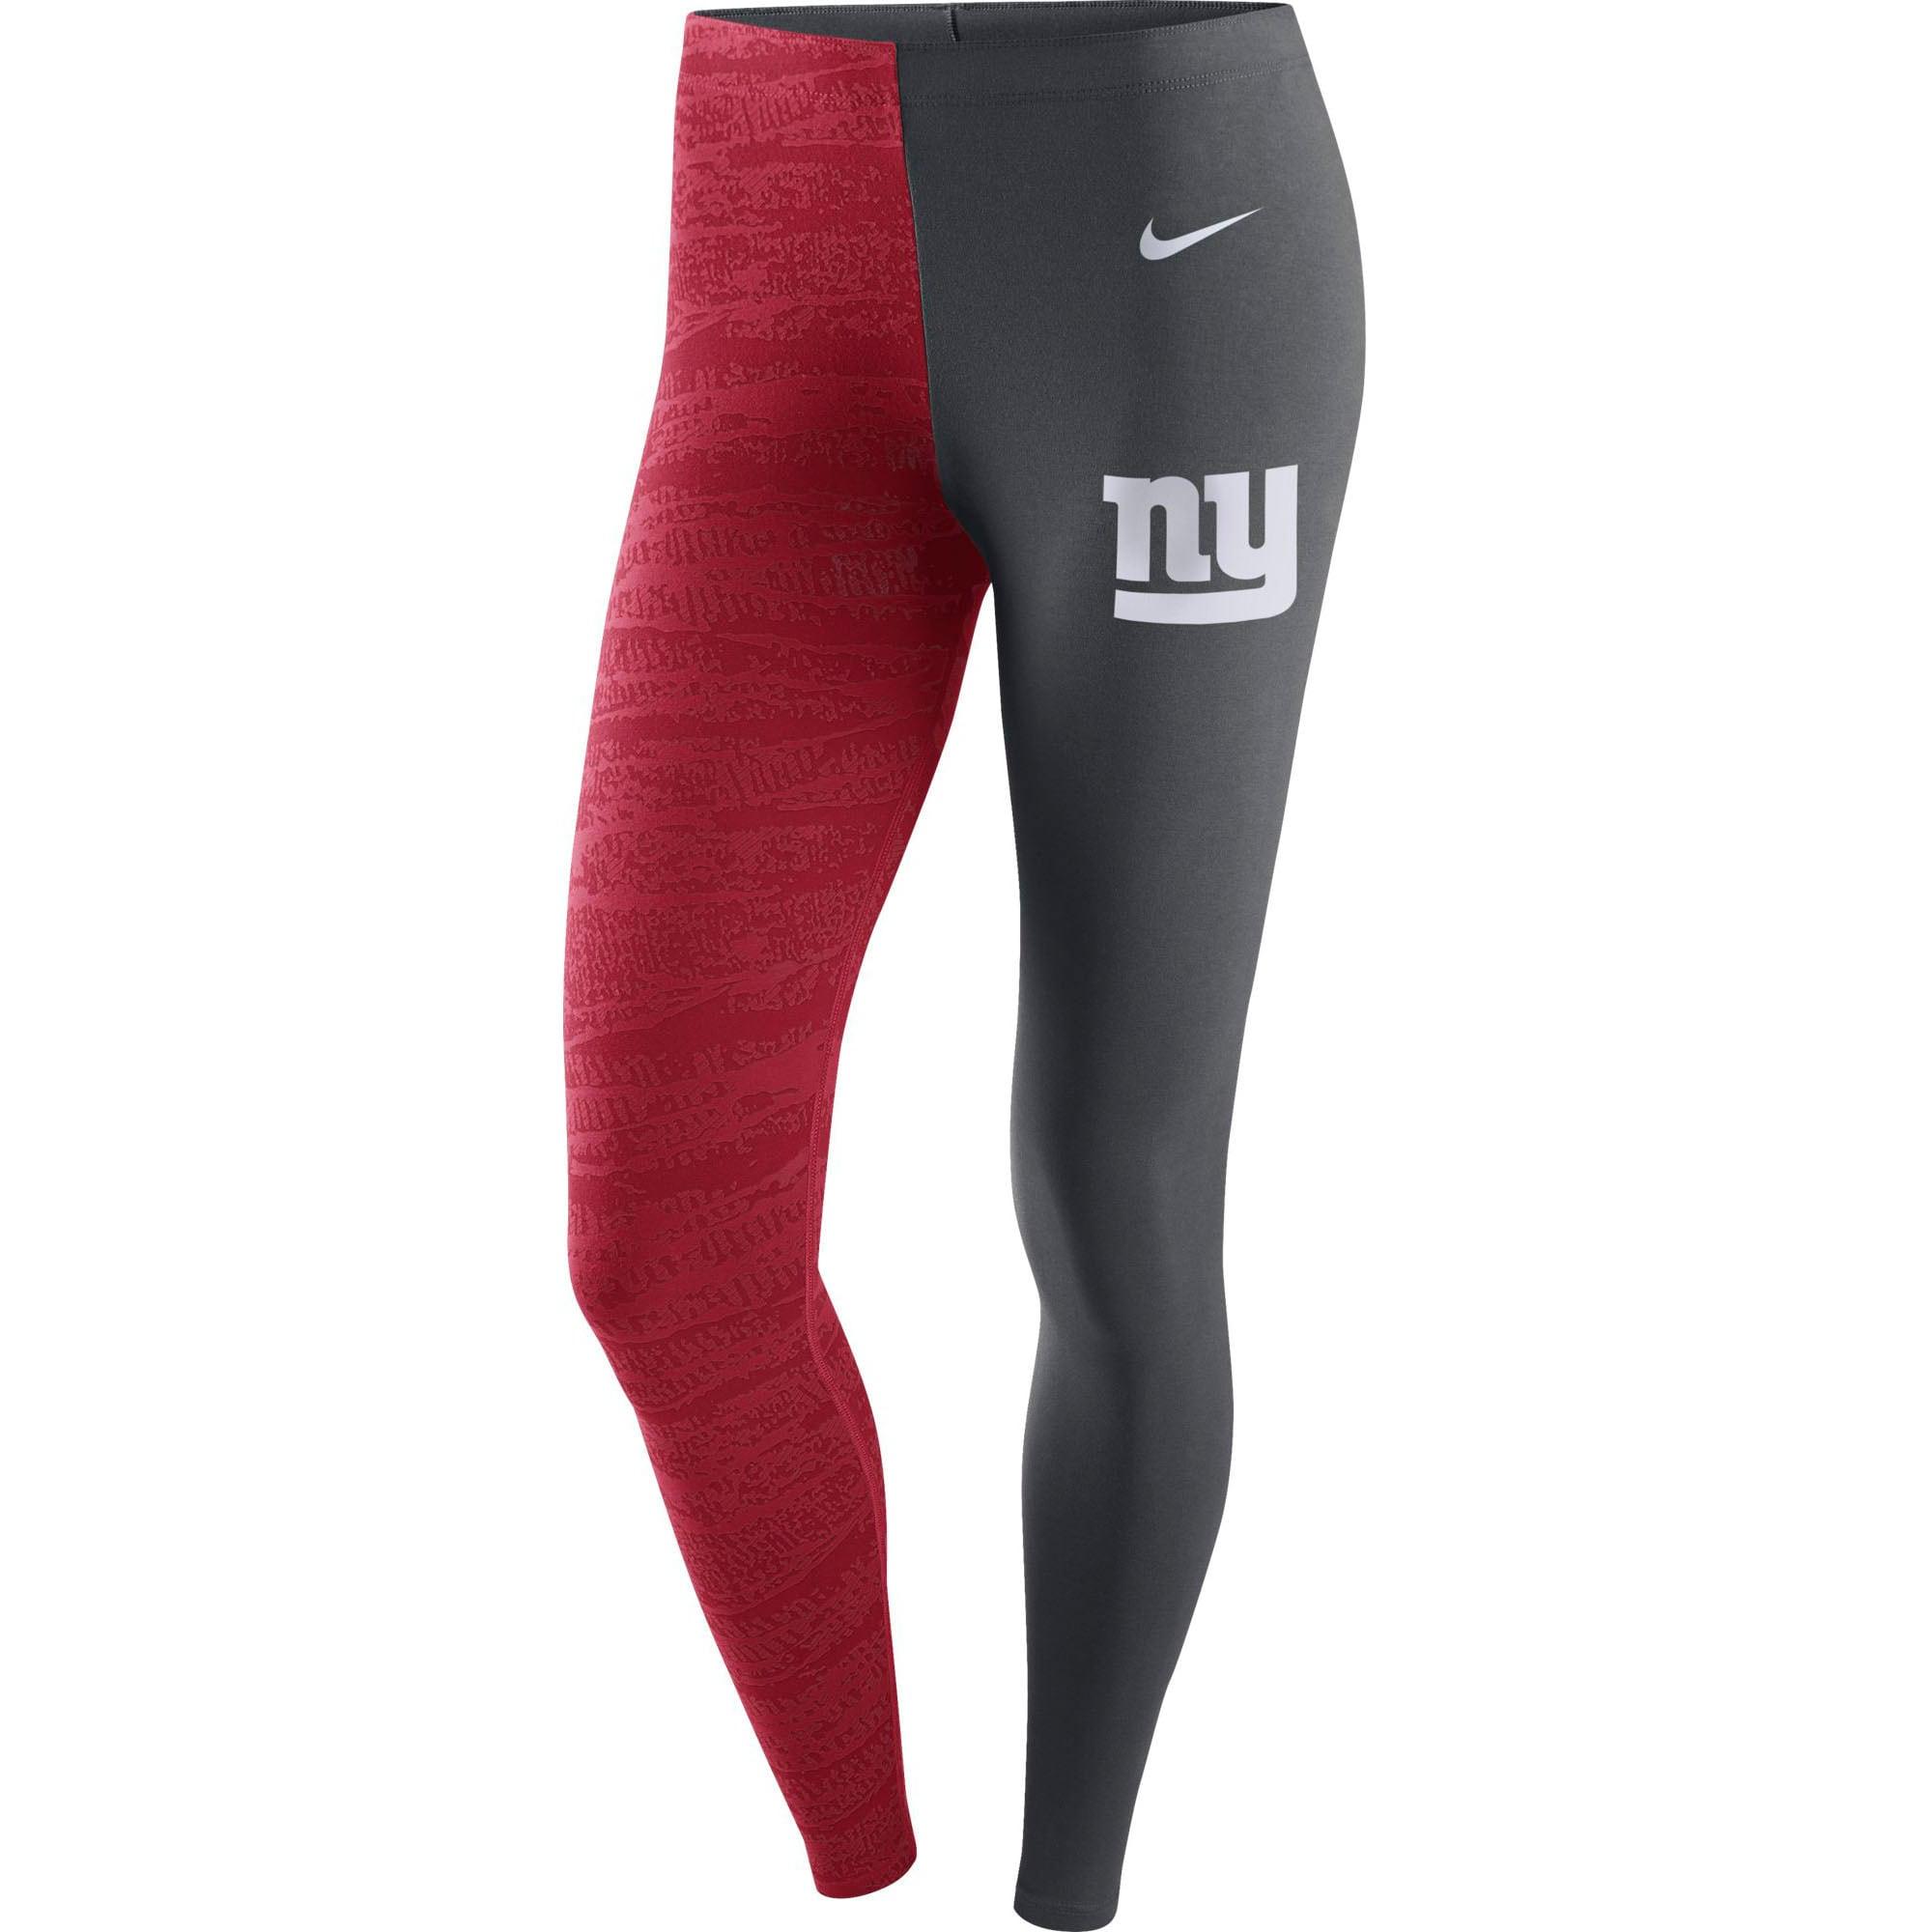 New York Giants Nike Women's Leg-A-See Leggings - Anthracite/Red